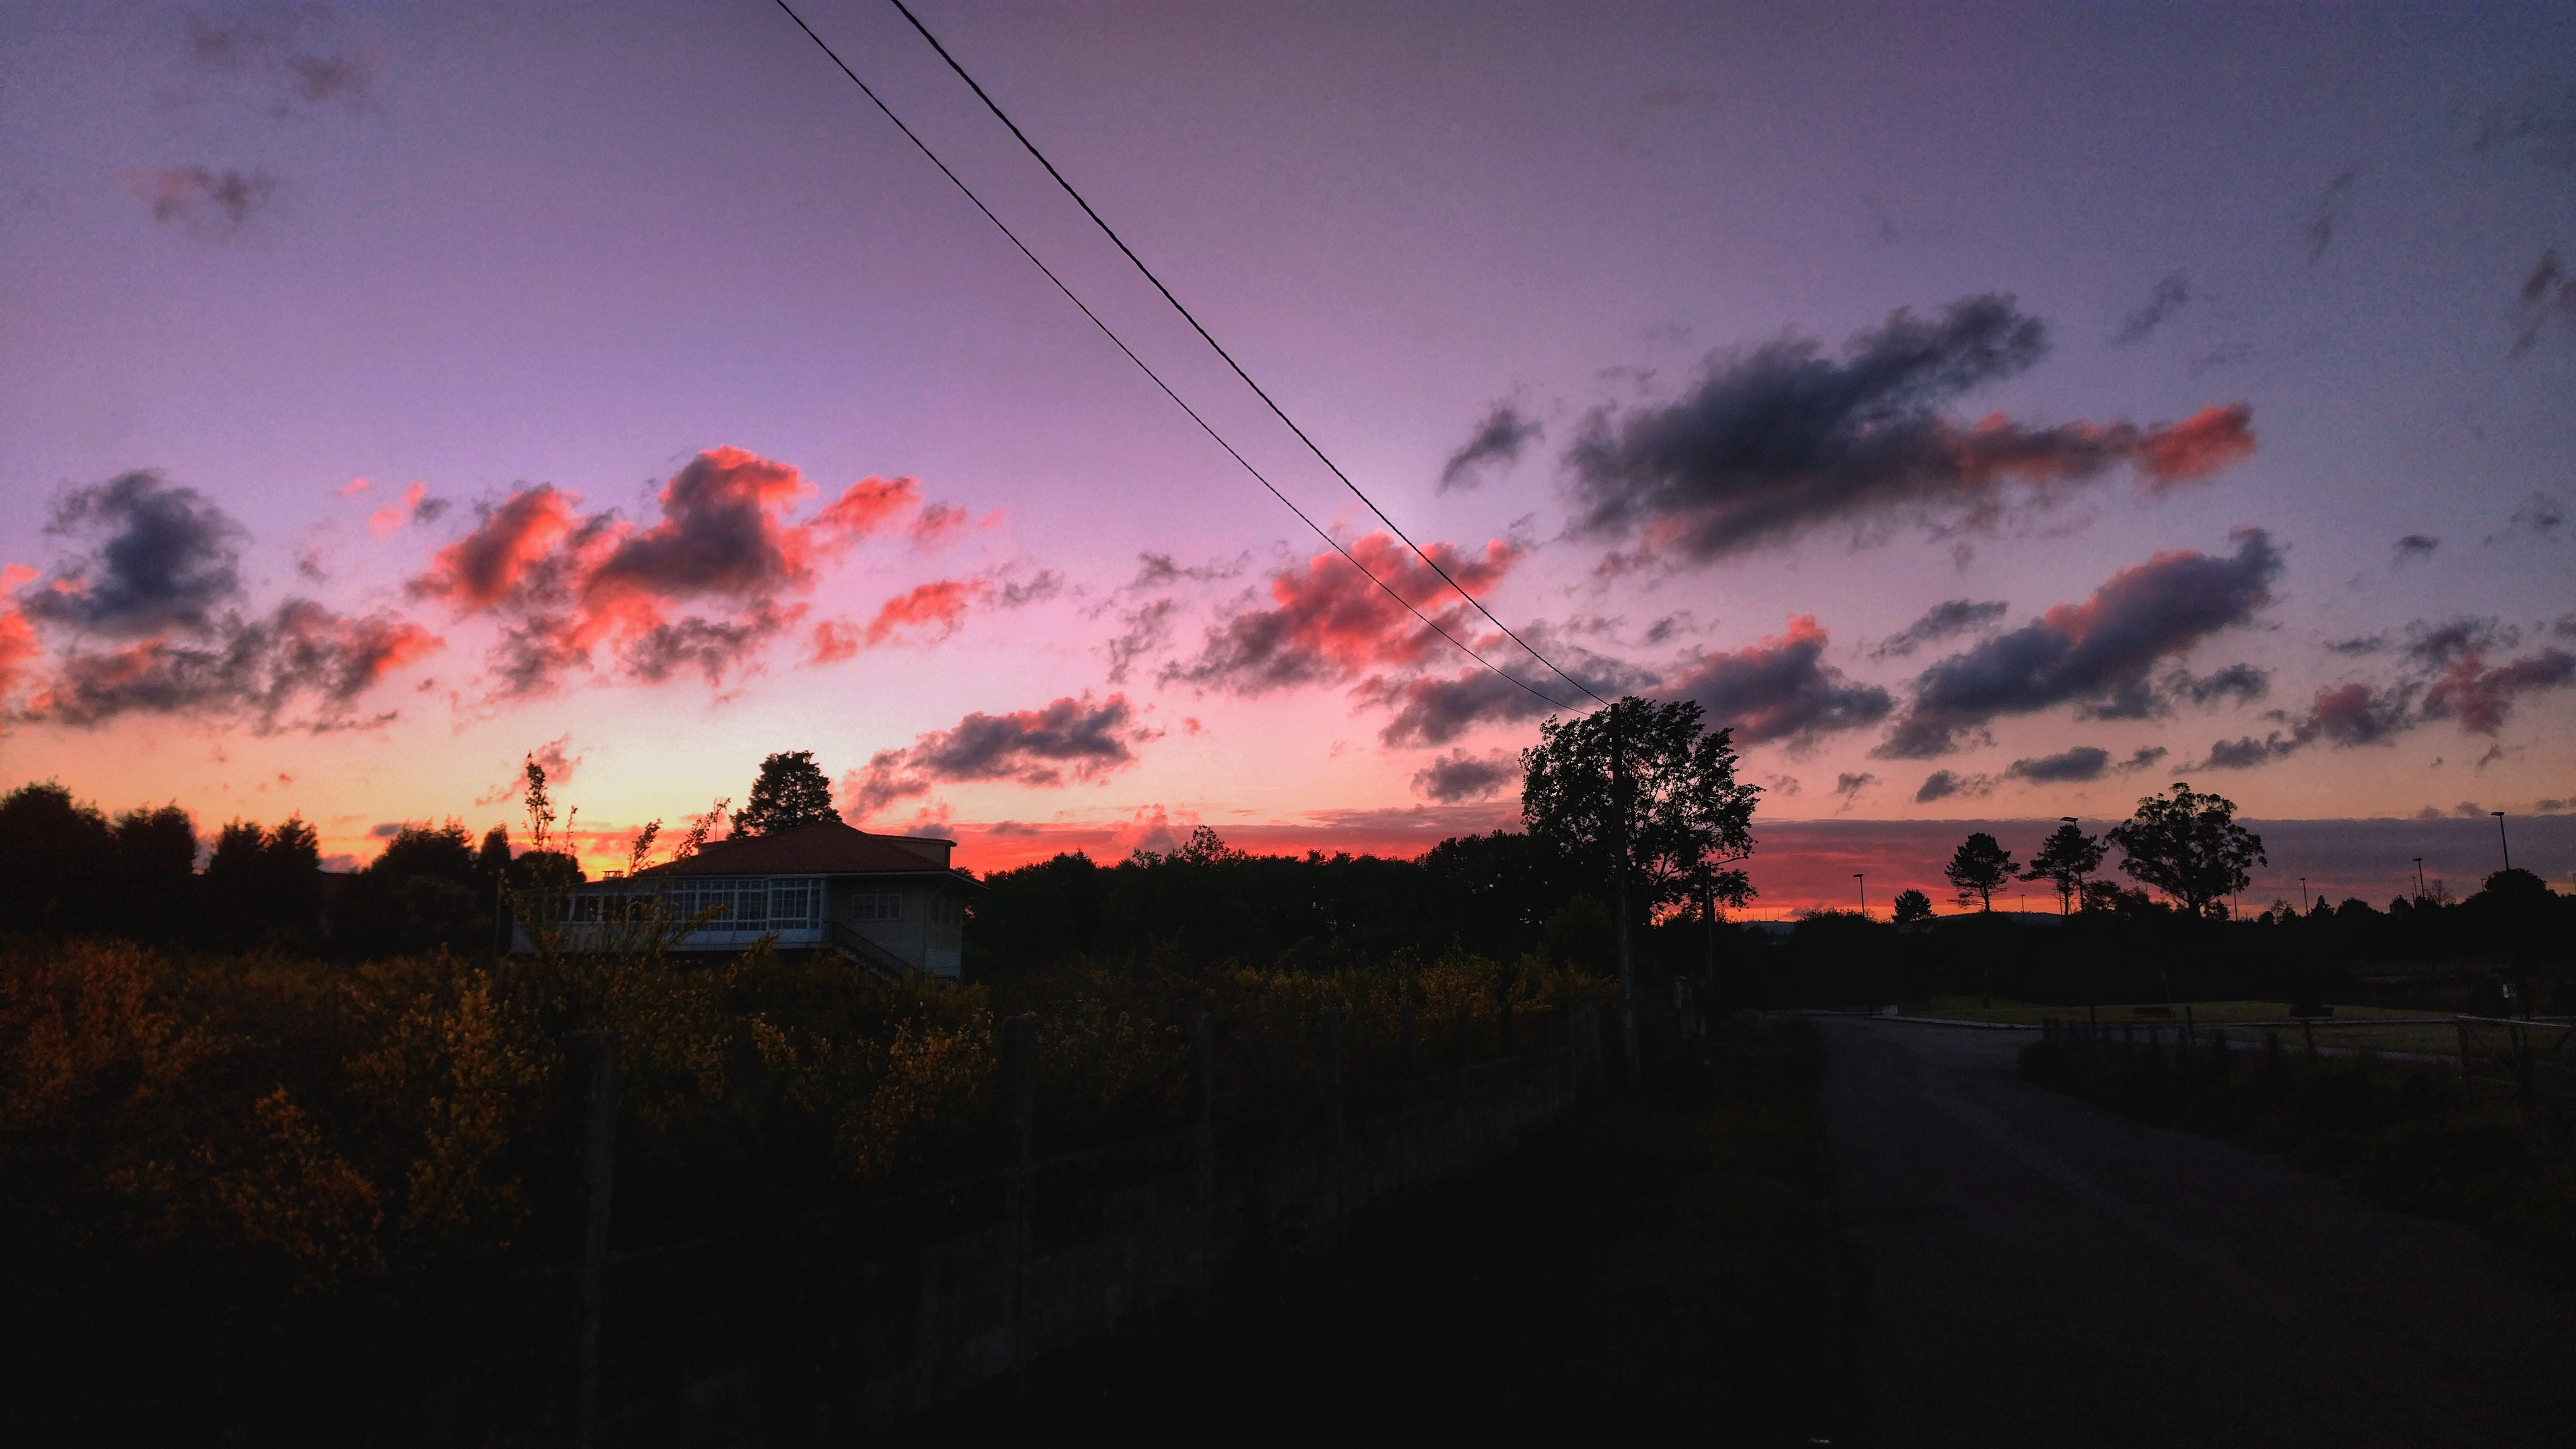 sunset sky road trees 4k 1541115007 - sunset, sky, road, trees 4k - sunset, Sky, Road